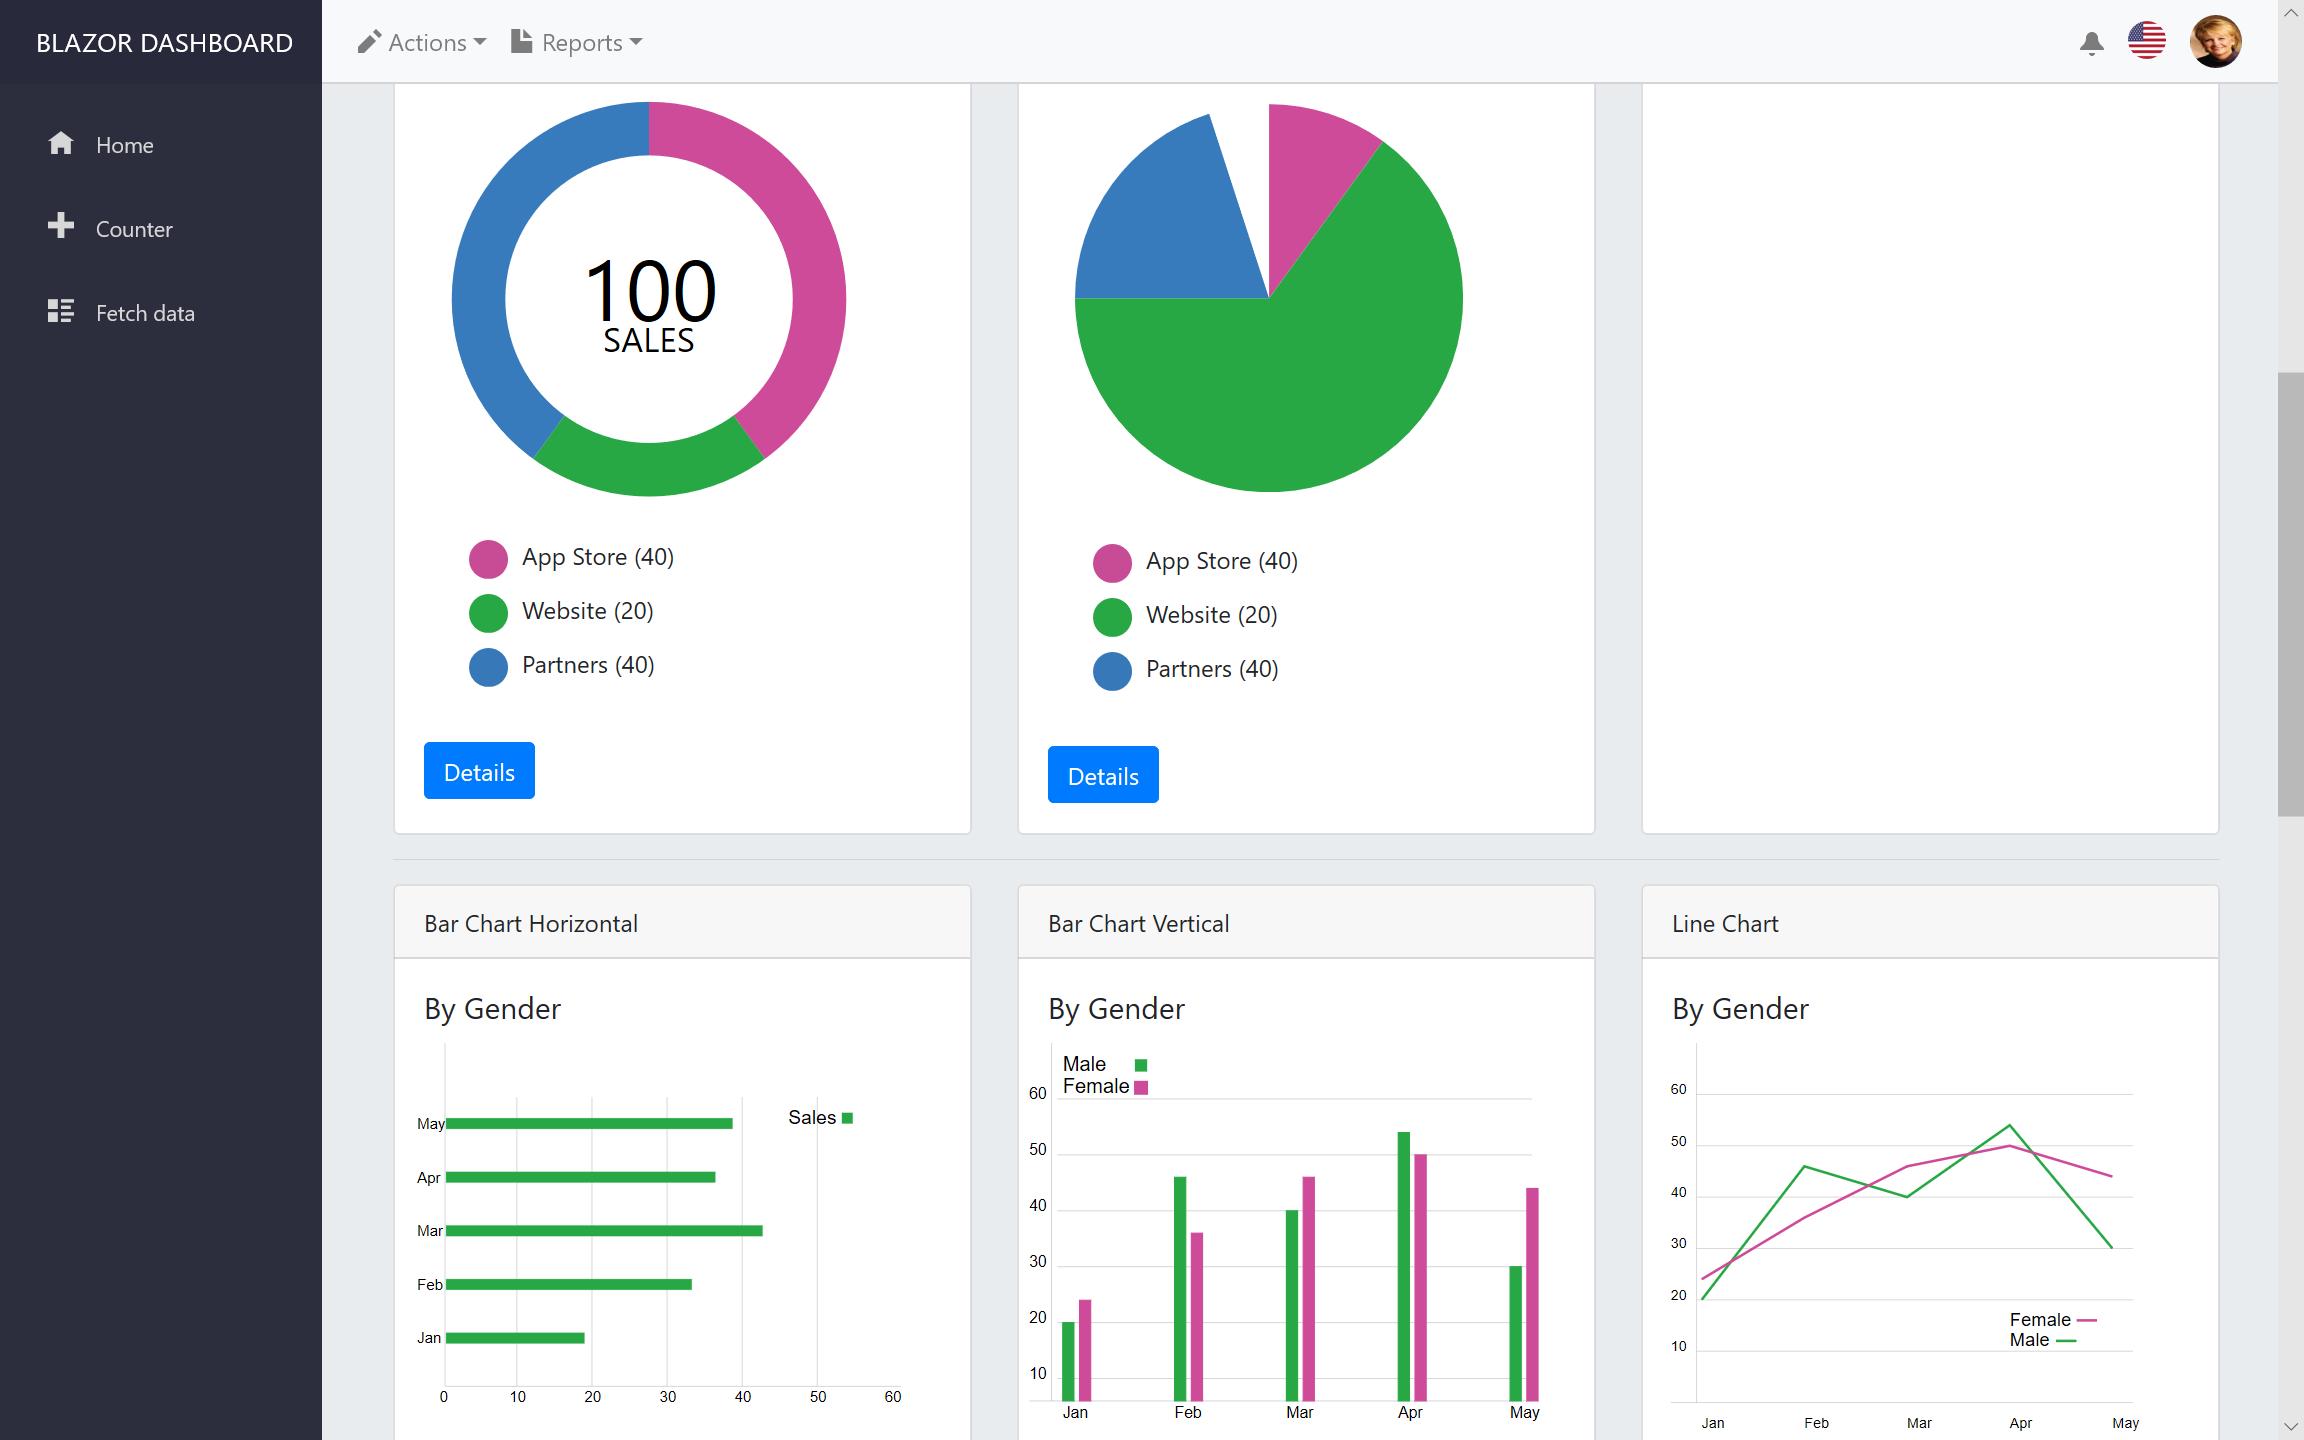 GitHub - Misfits-Rebels-Outcasts/Blazor-Dashboard: Admin